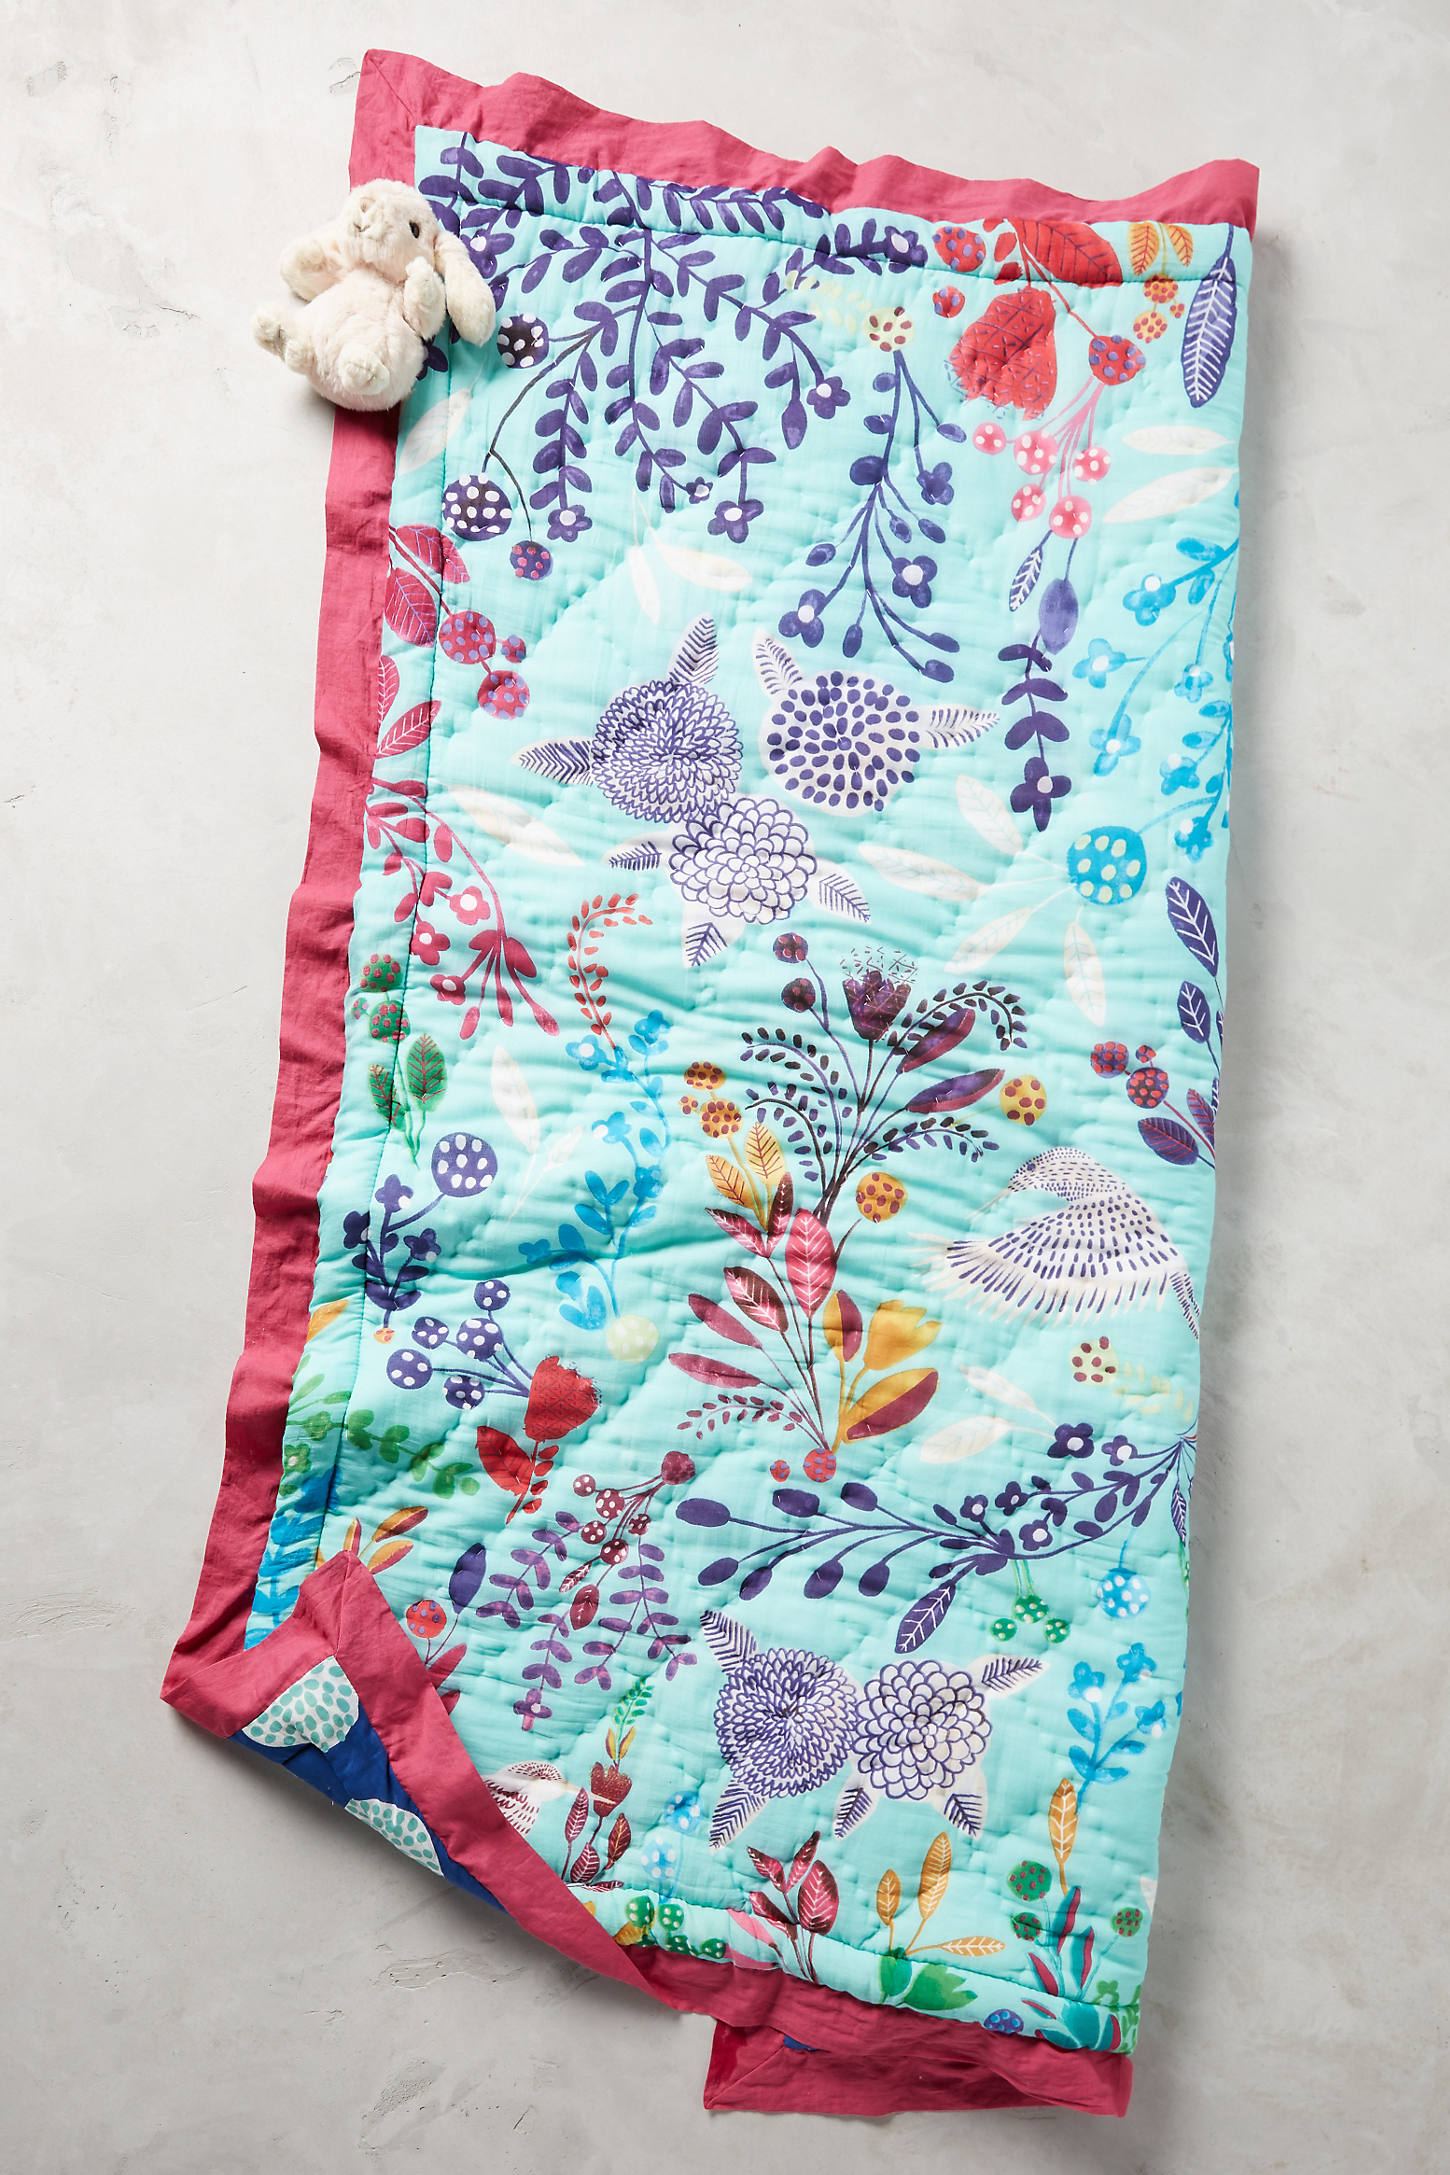 Folkloric Toddler Quilt & Playmat